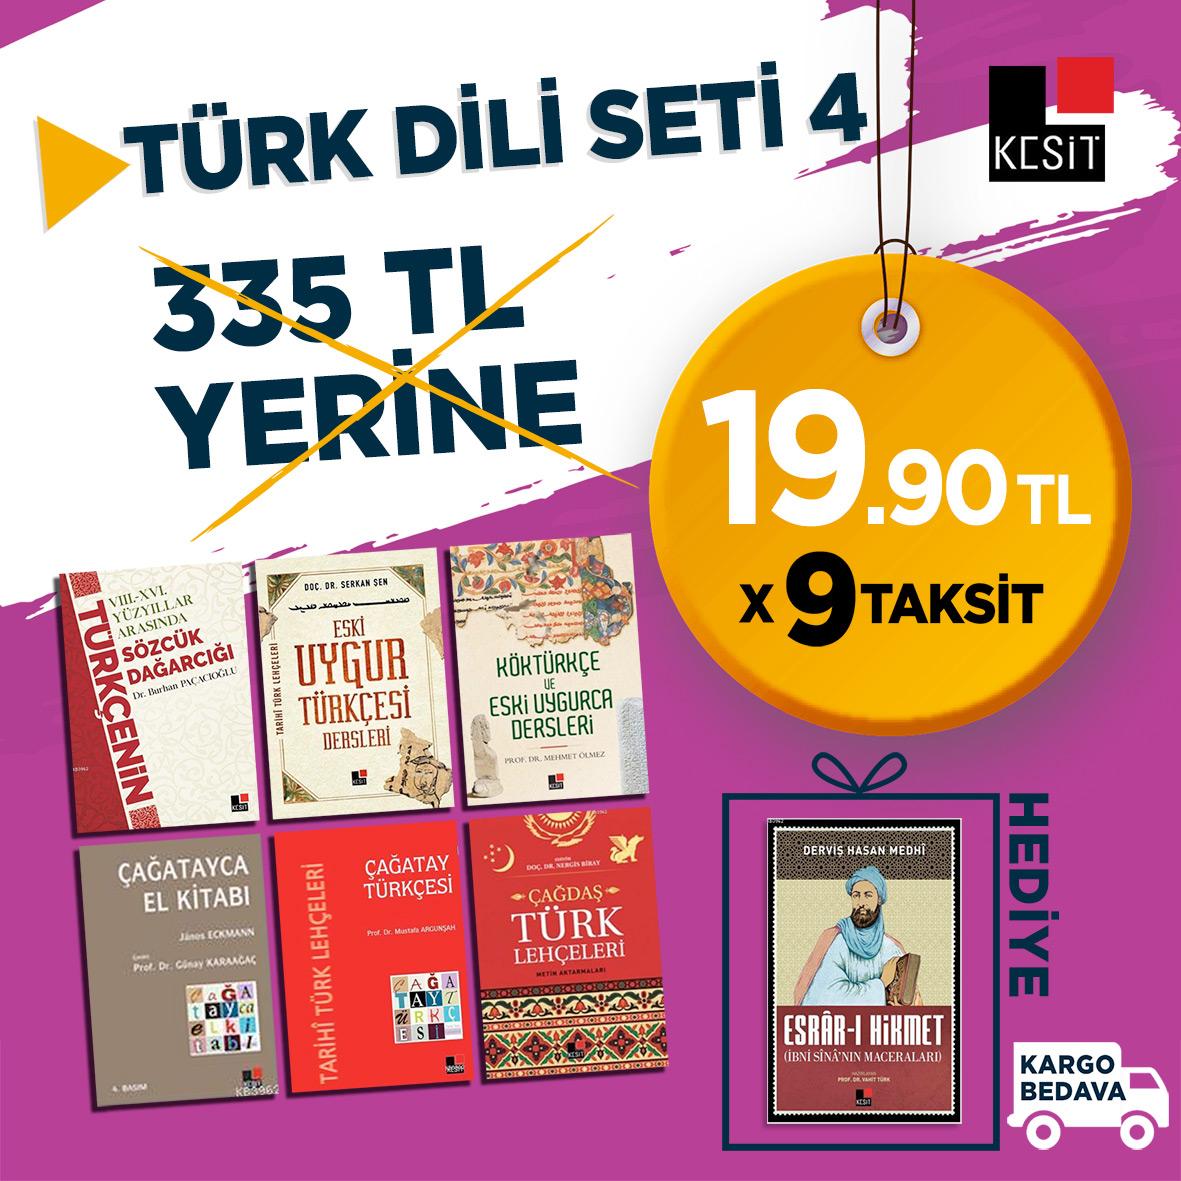 Türk Dili Seti 4